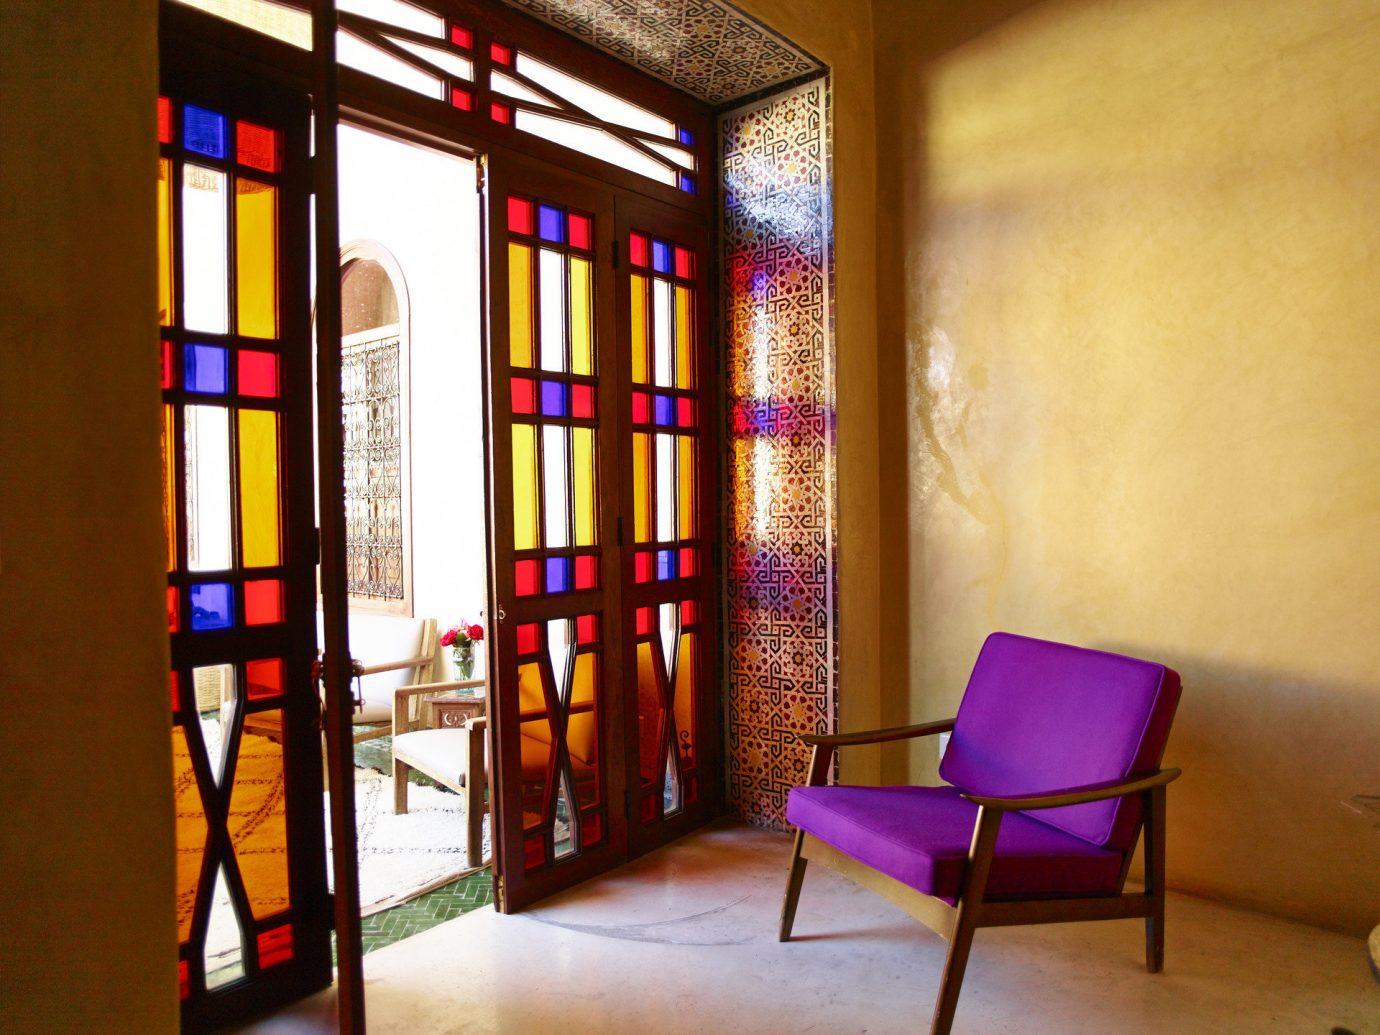 Hotels floor color indoor room wall window interior design home glass living room Design modern art furniture window covering material